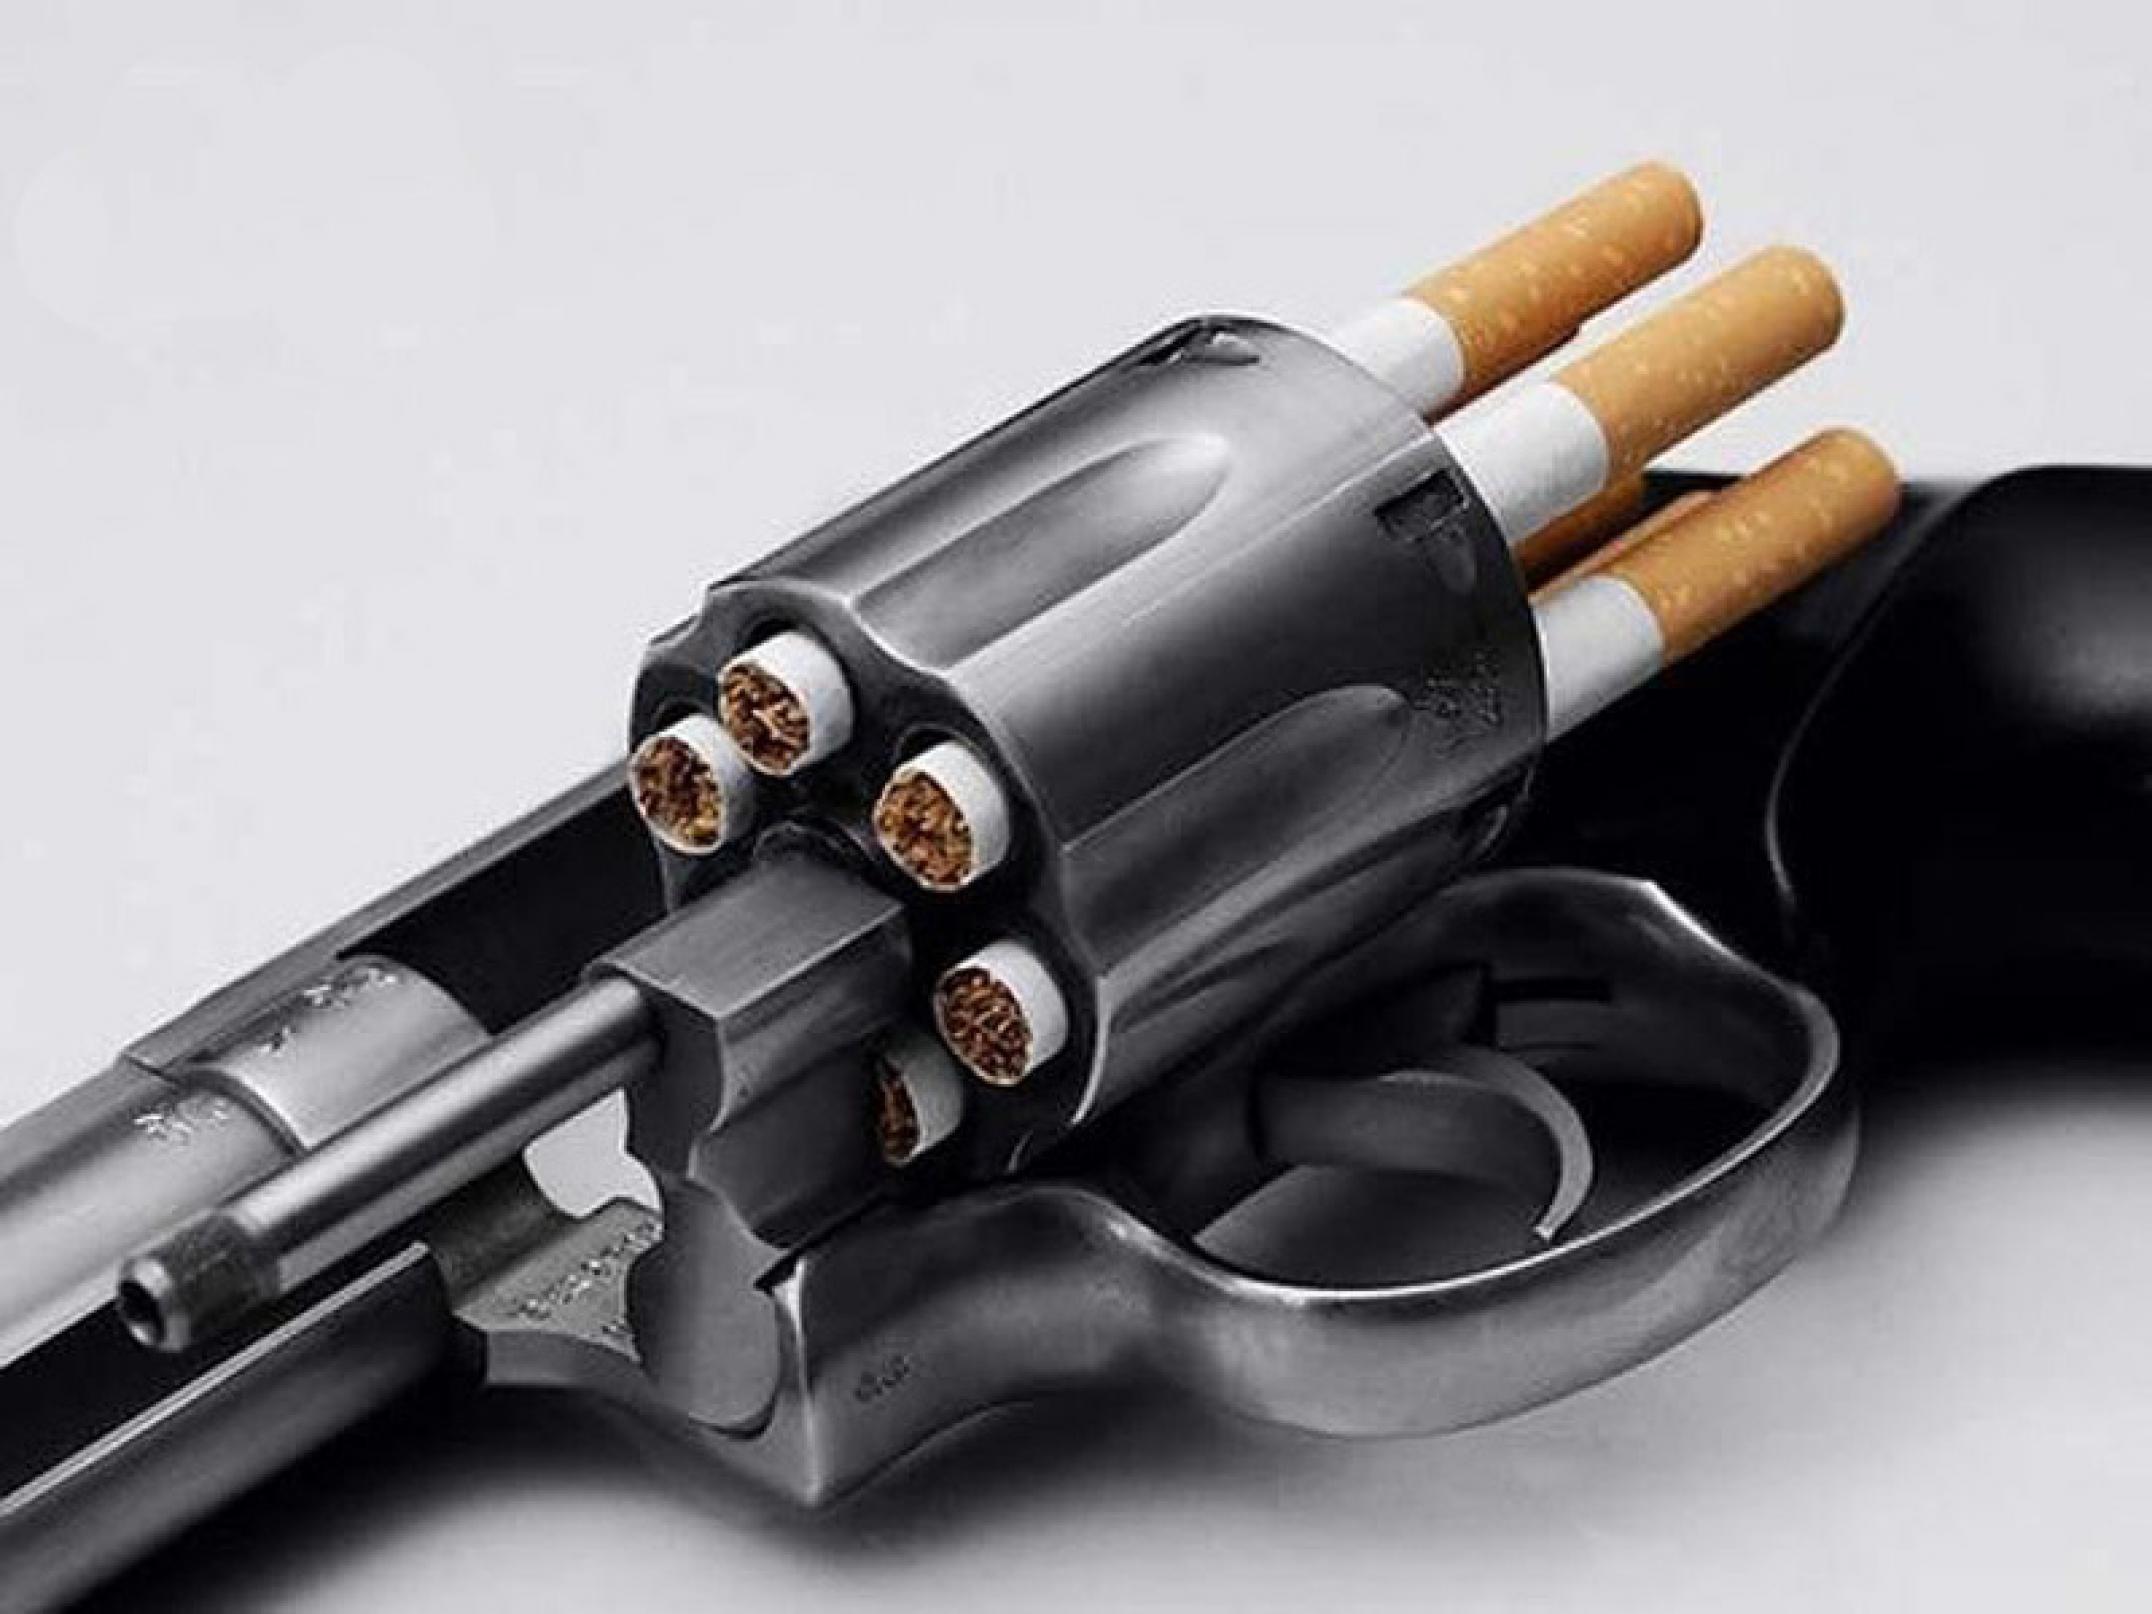 smoker passive smoking and visual argument